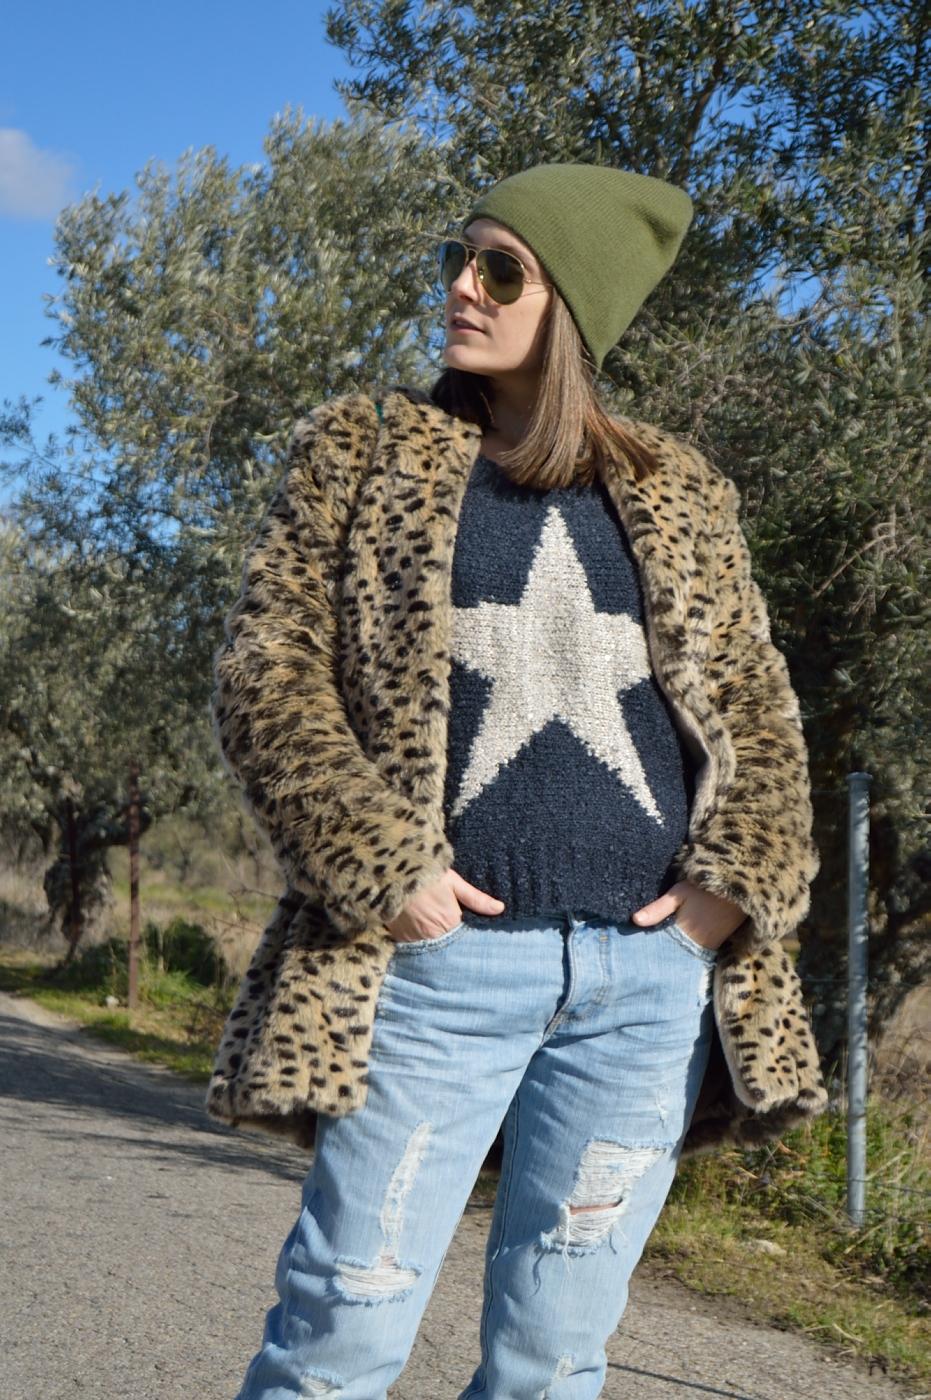 lara-vazquez-mad-lula-style-look-leopard-fashion-faux-fur-coat